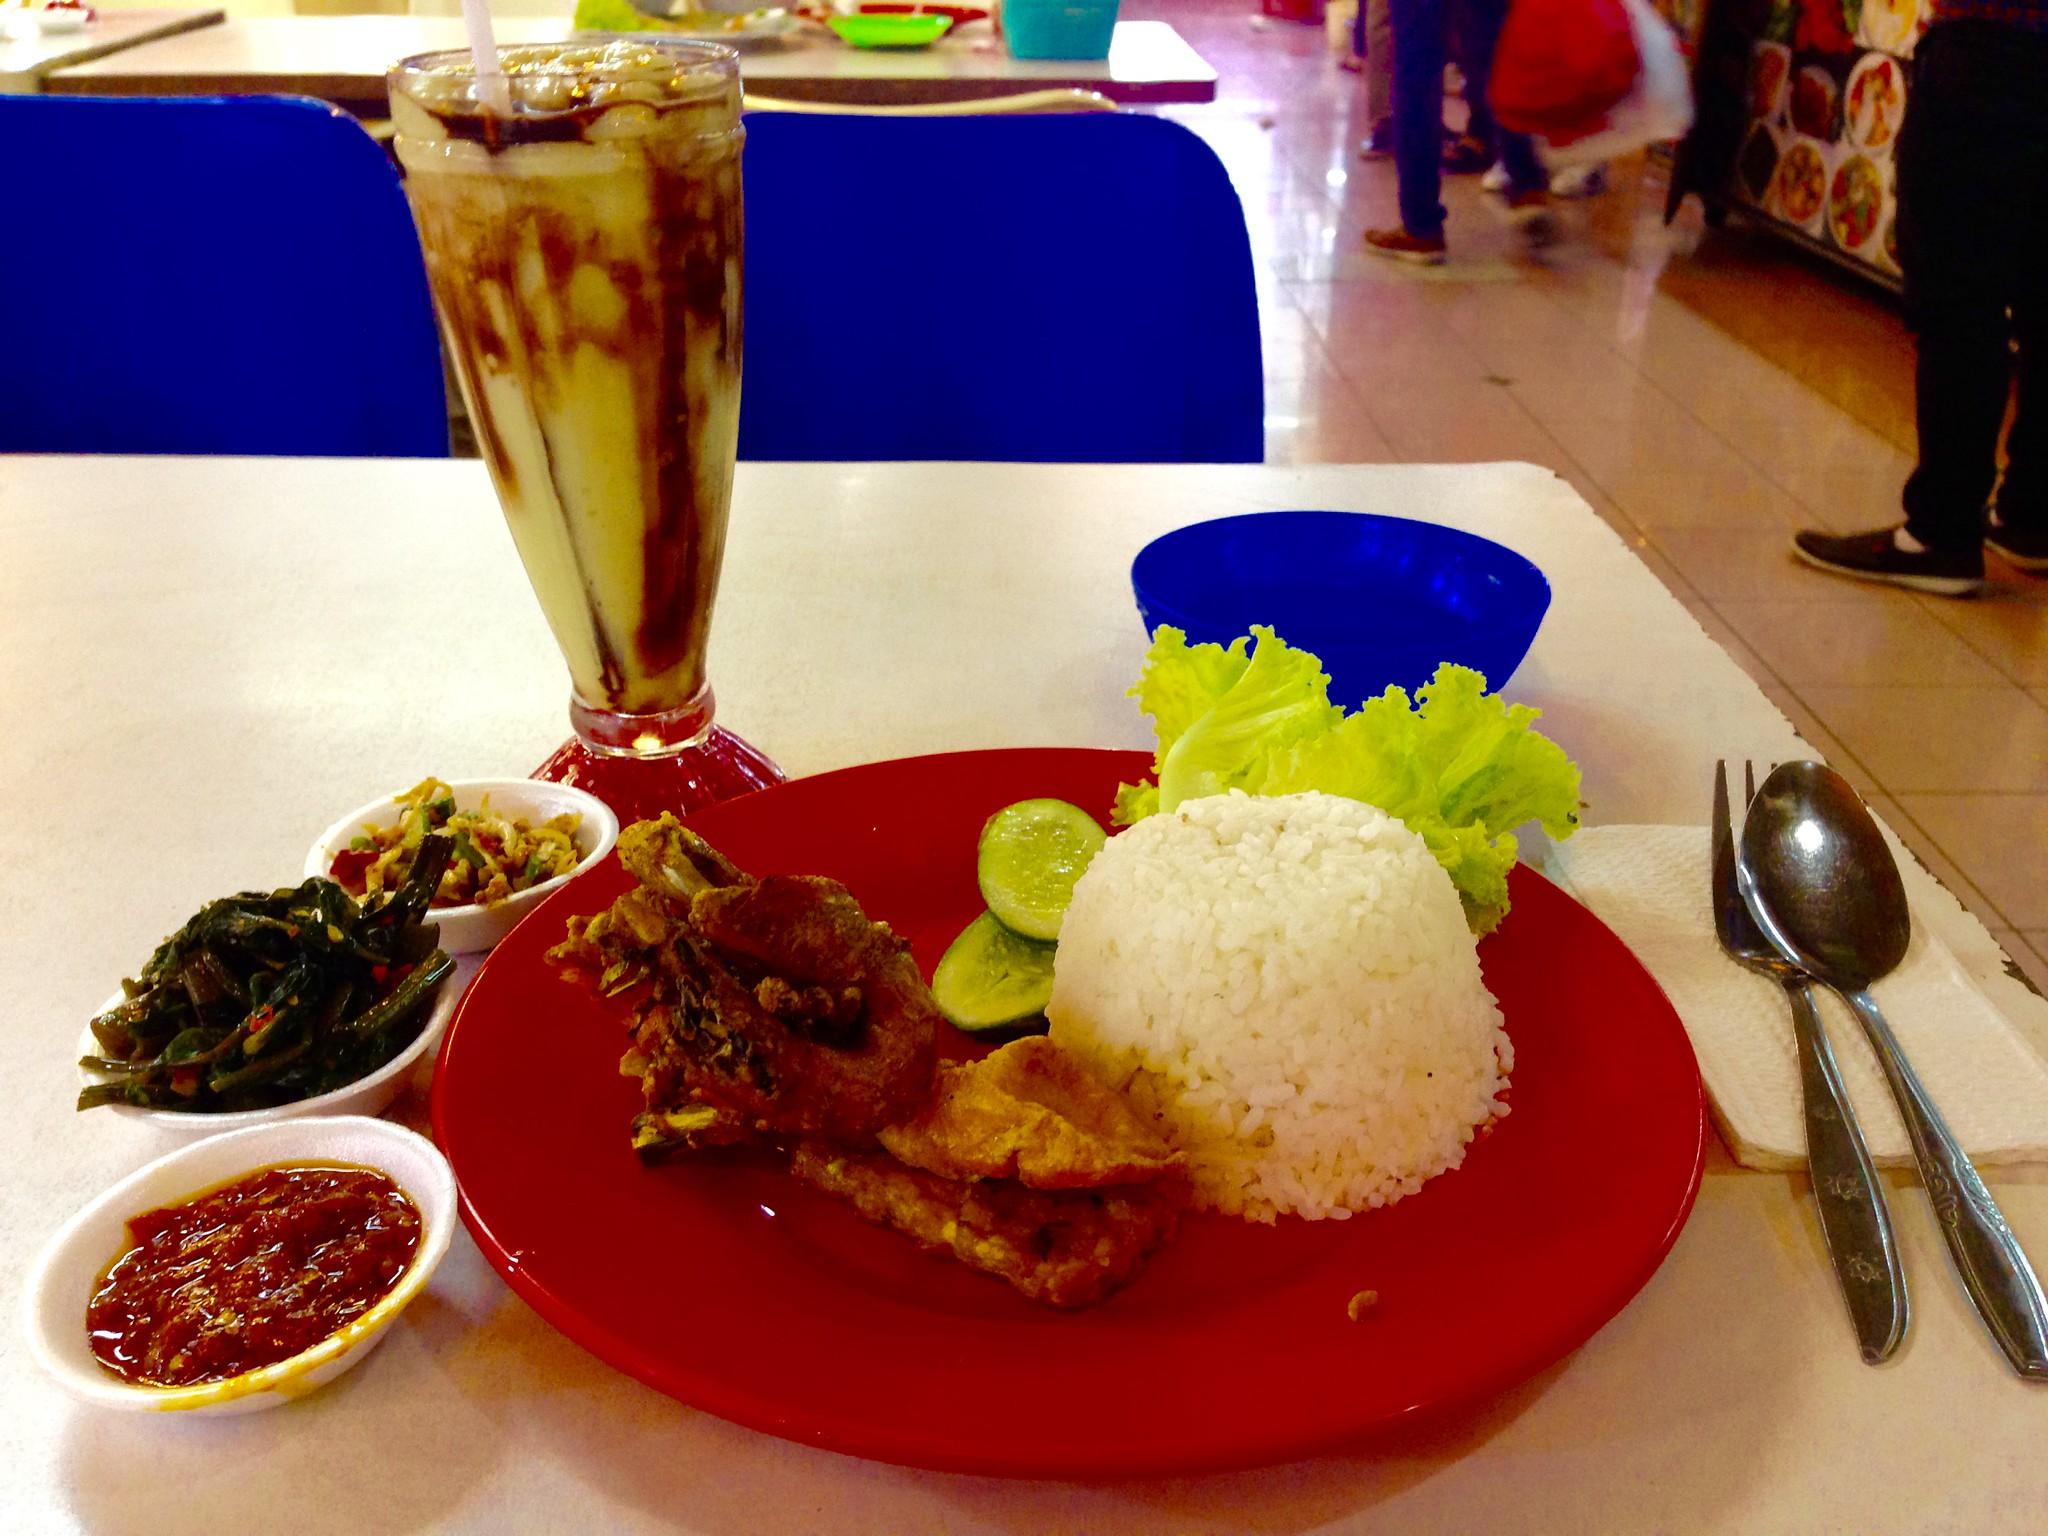 3 USD meal of fried chicken and avocado shake, Bandung